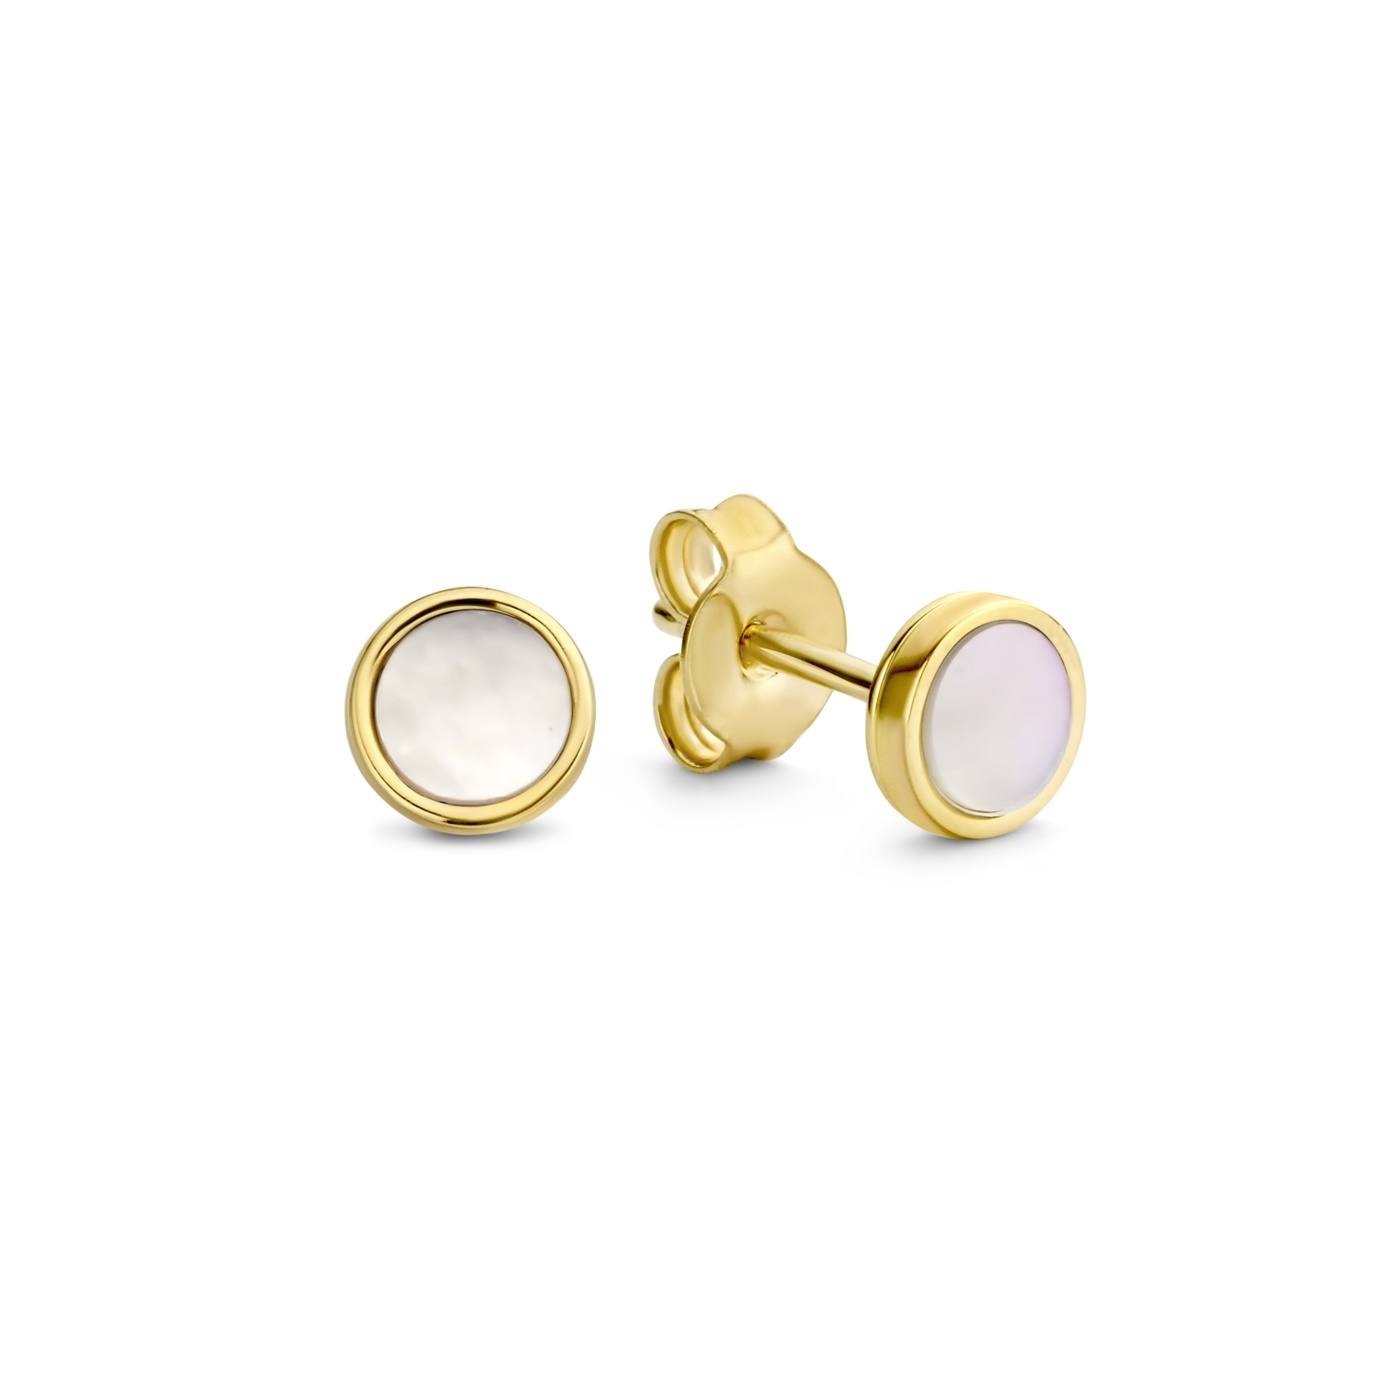 Isabel Bernard Belleville Lena orecchini a bottone in oro 14 carati